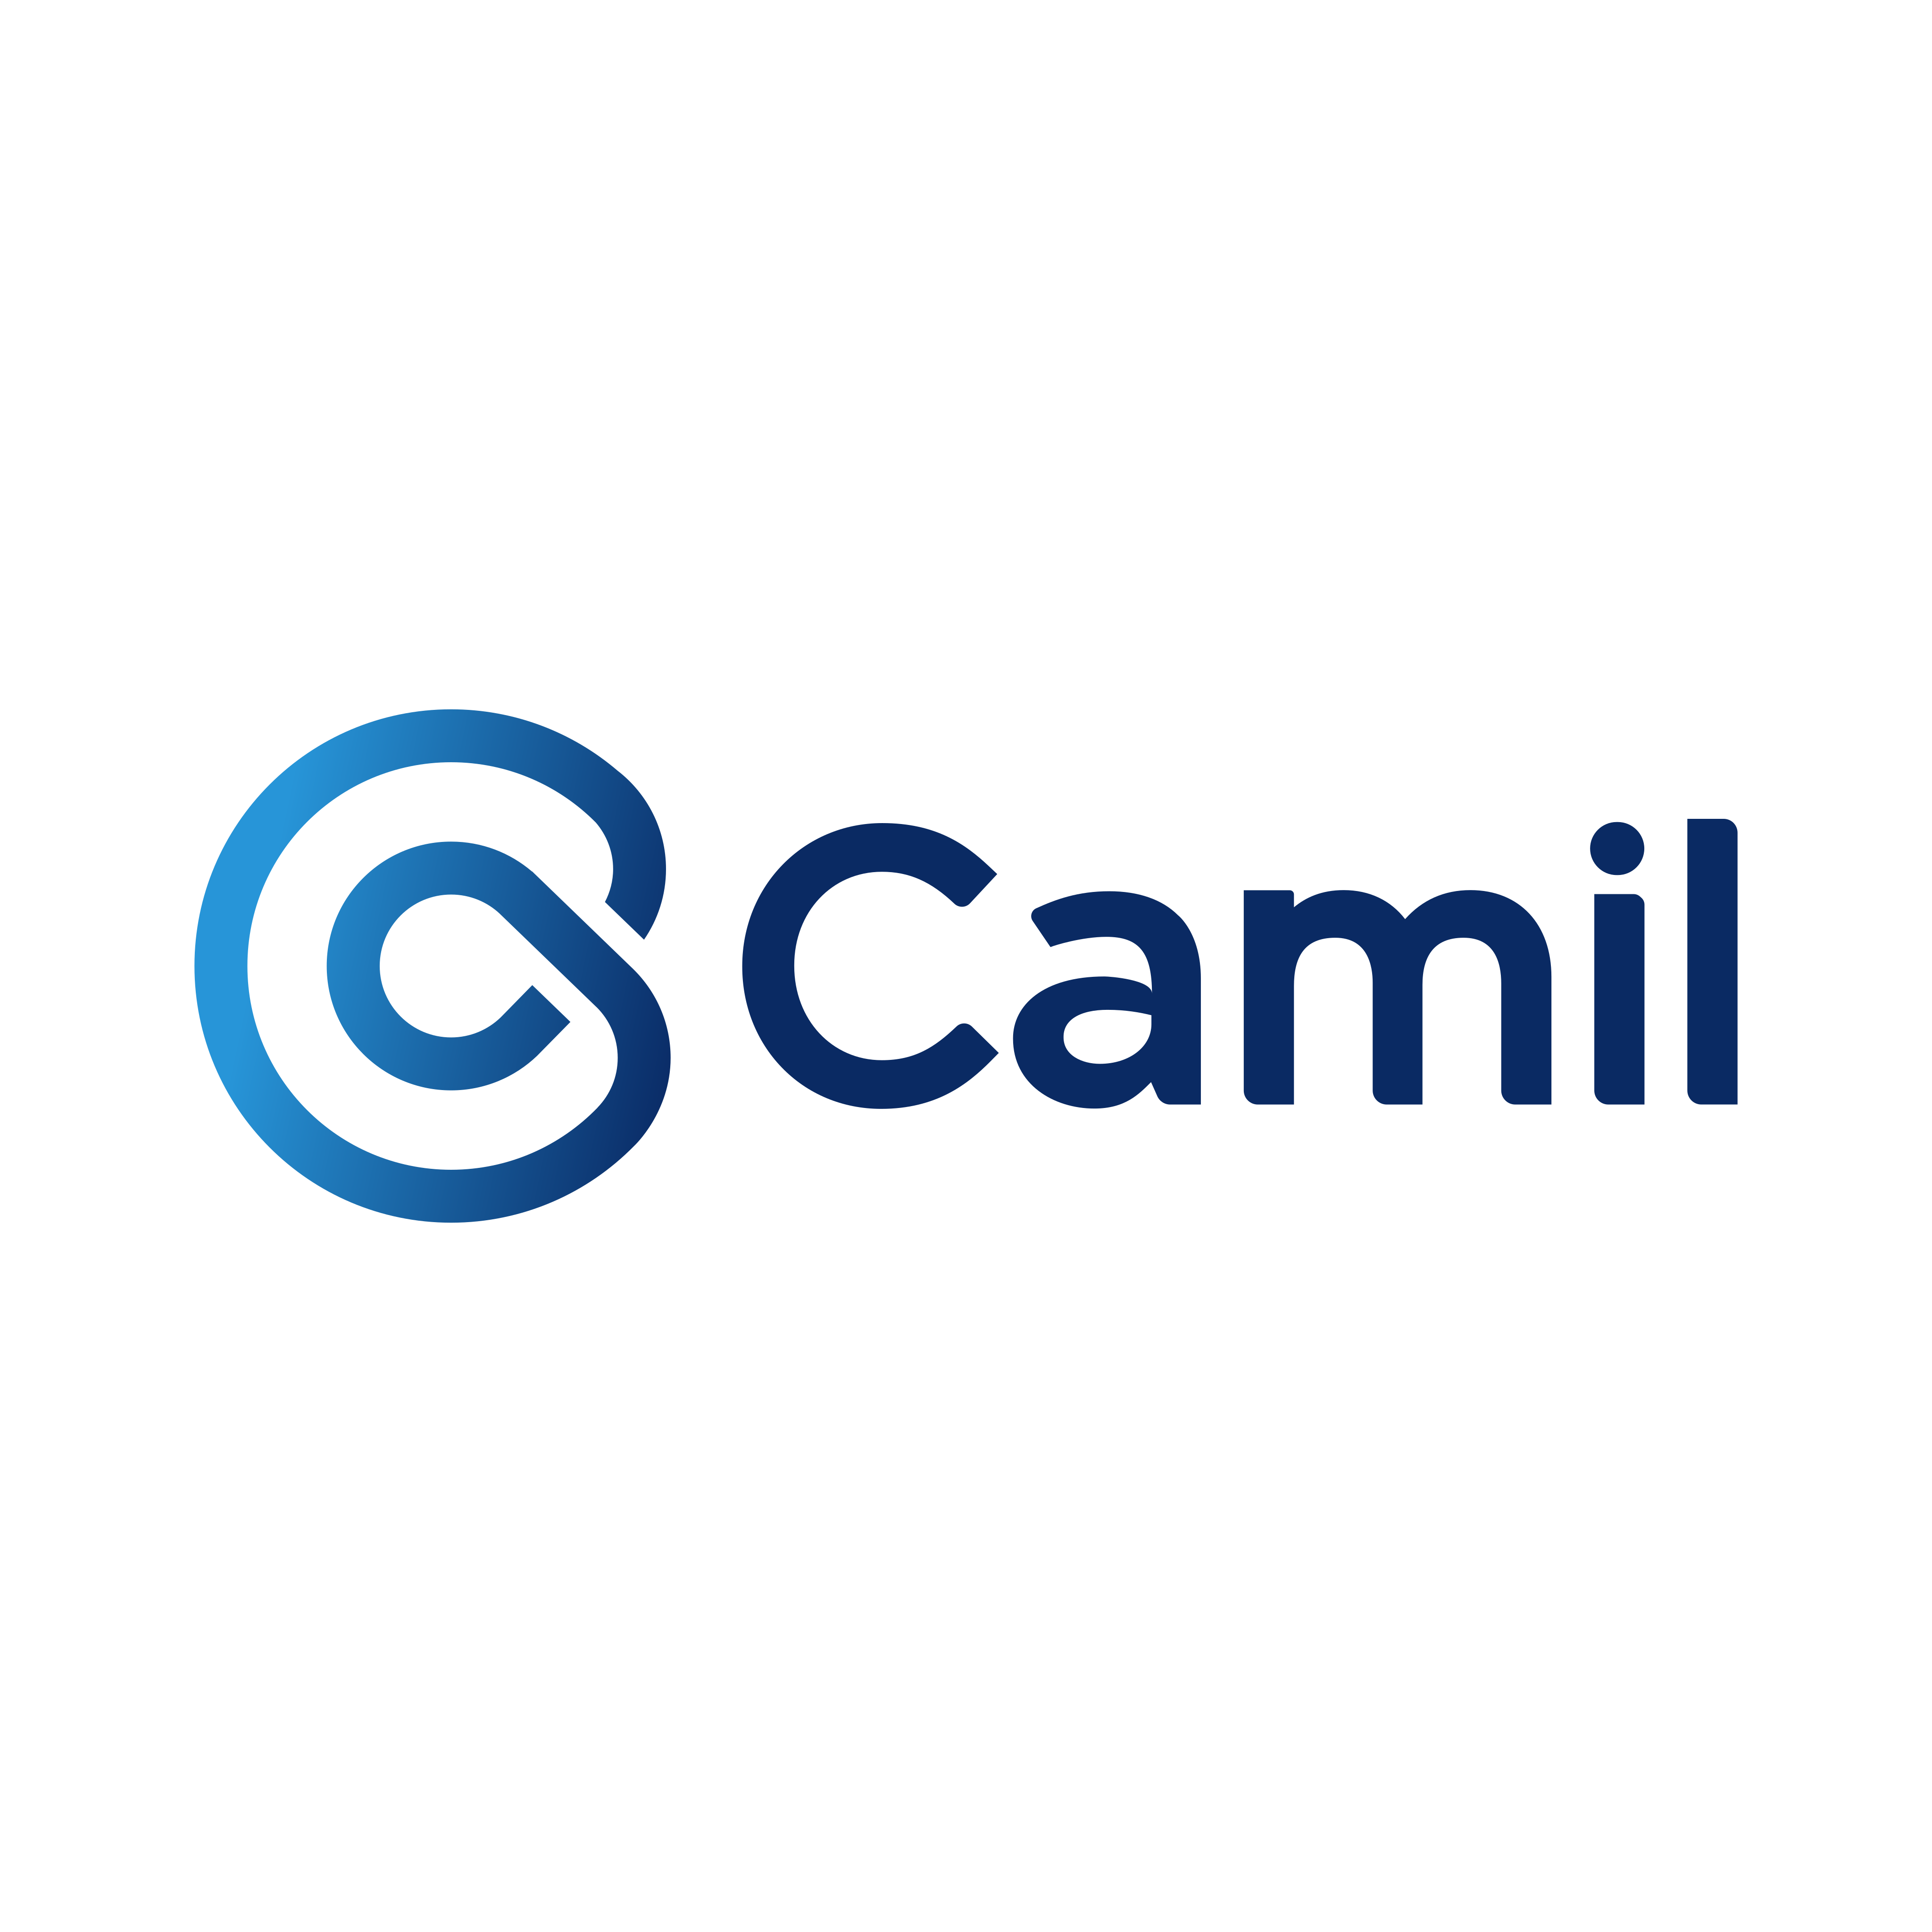 camil logo 0 - Camil Logo